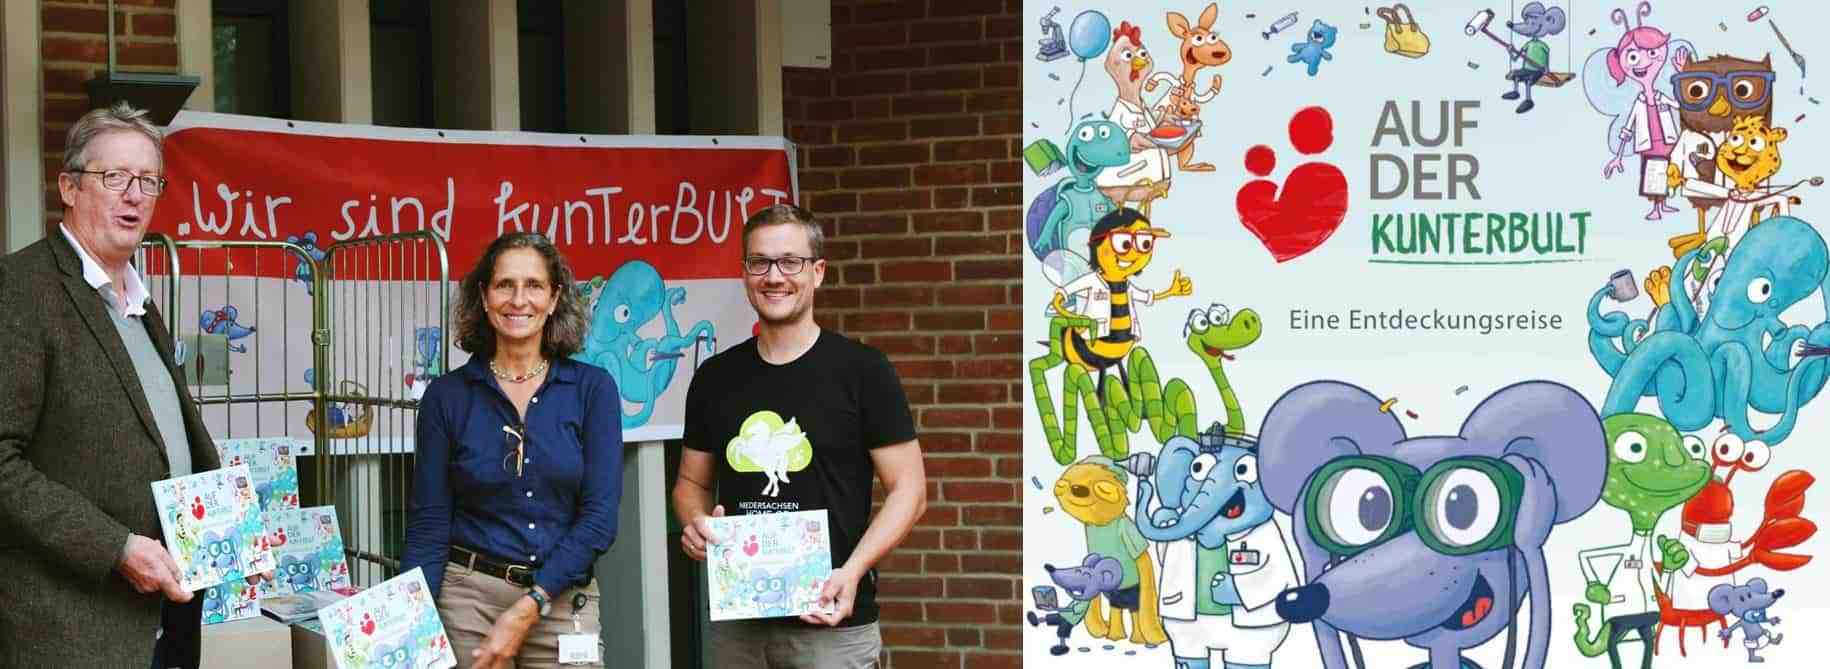 style hannover business for kids buch kunterbunt - Business for Kids - Kinderaugen leuchten lassen